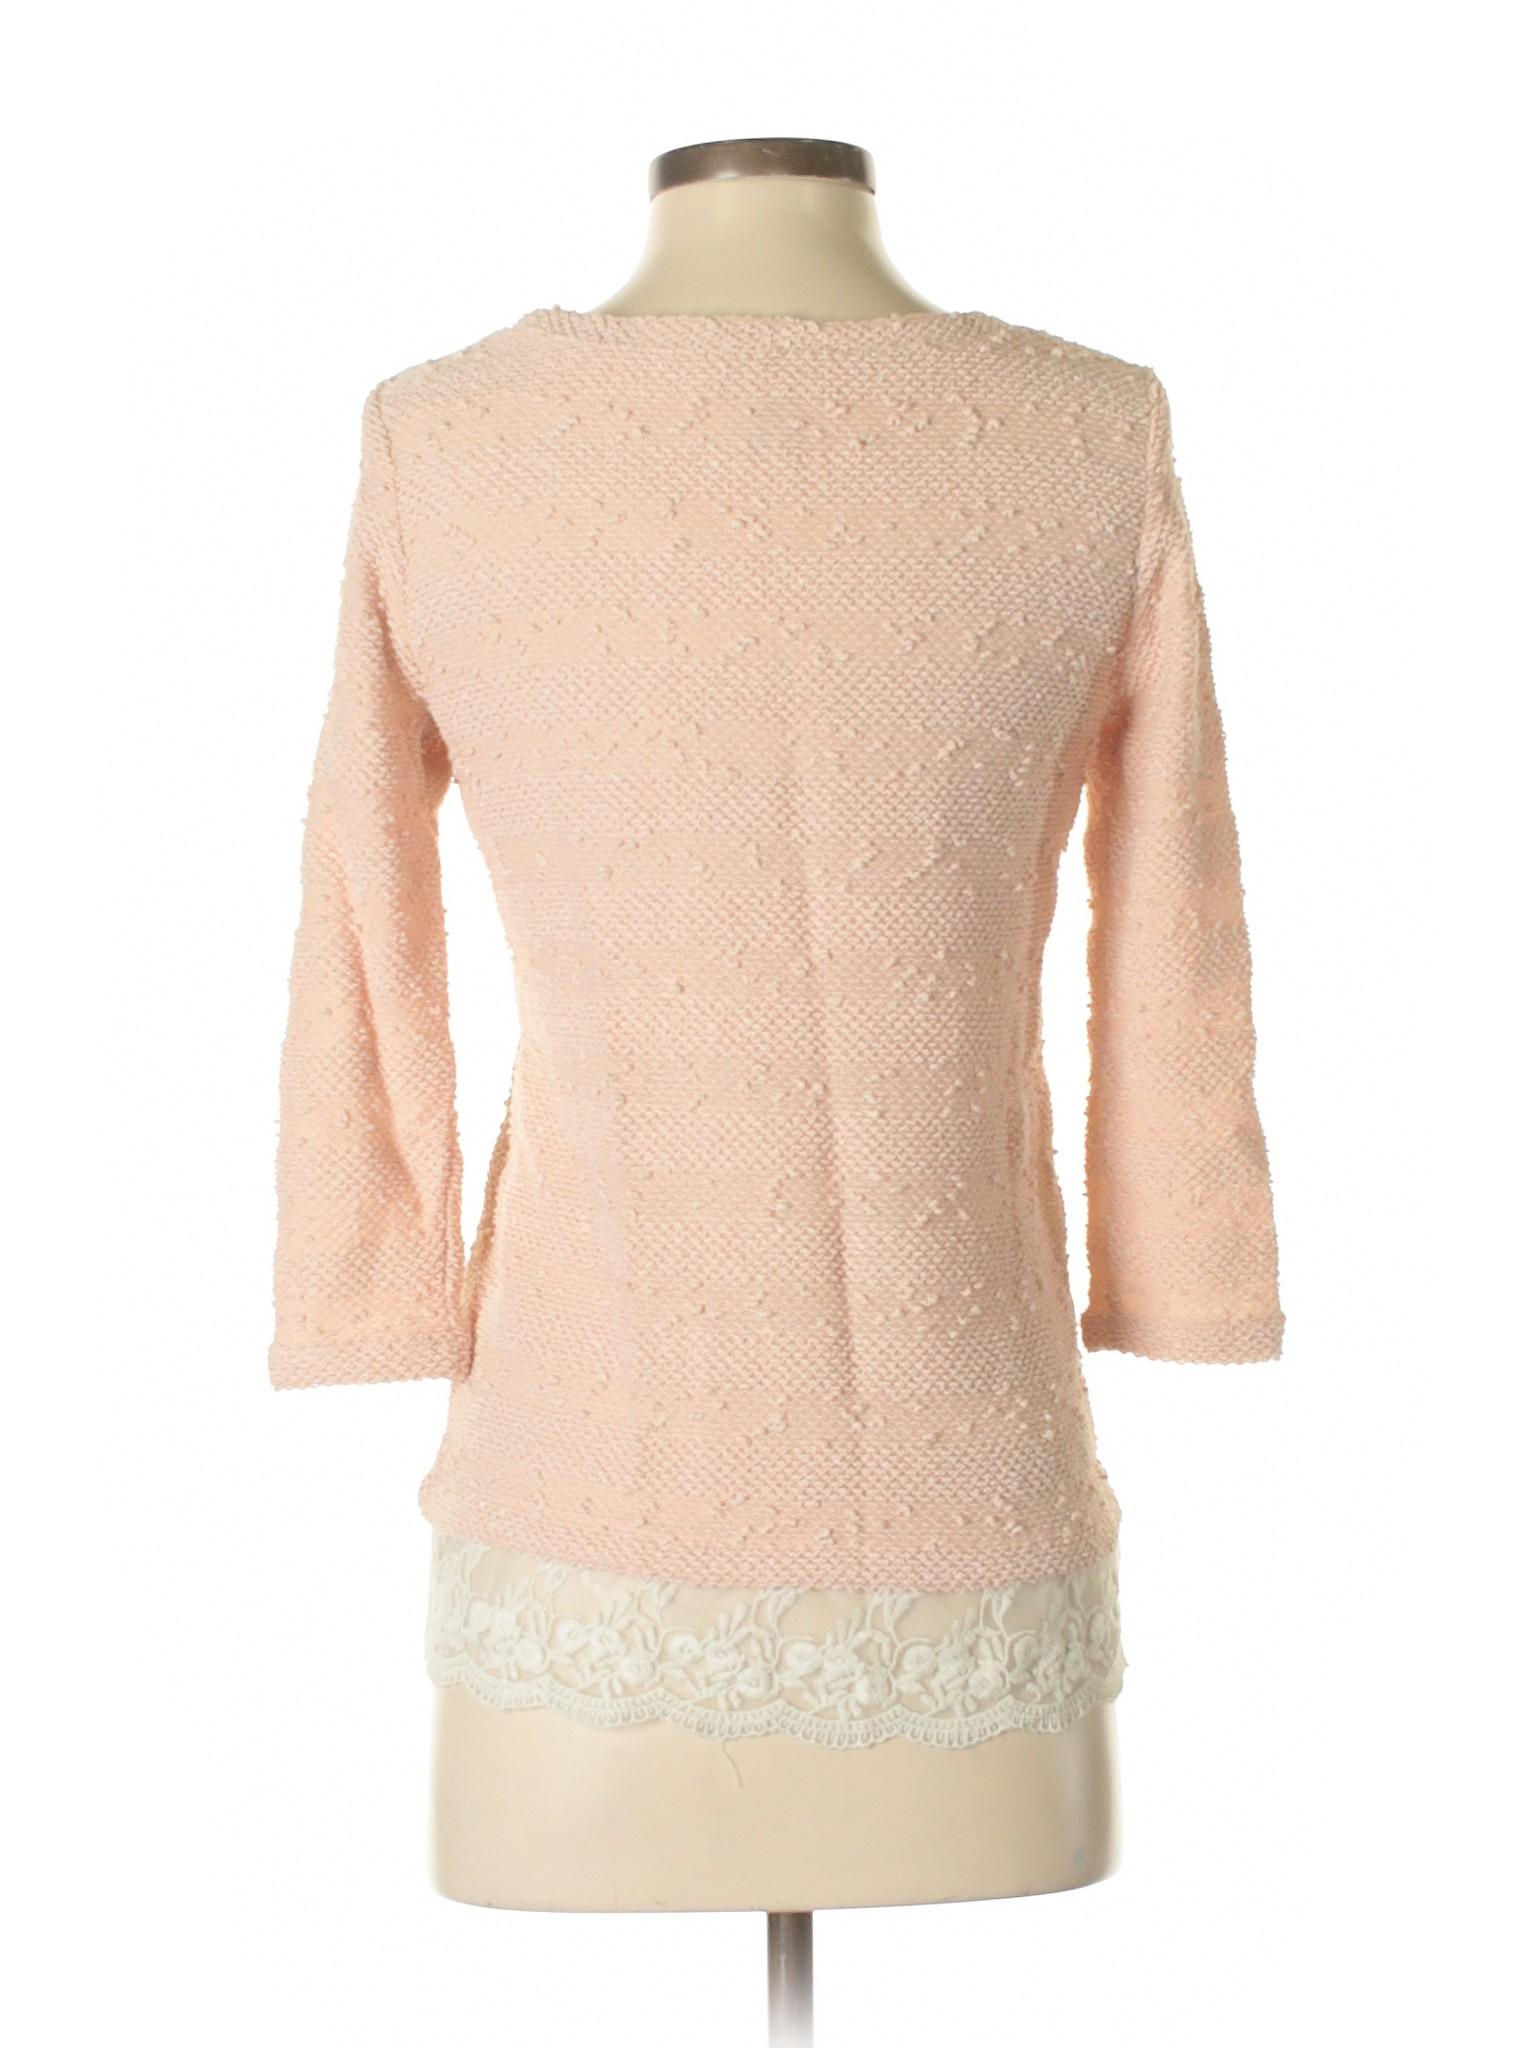 Sweater LOFT Ann Taylor Boutique Outlet Pullover q47UTPw